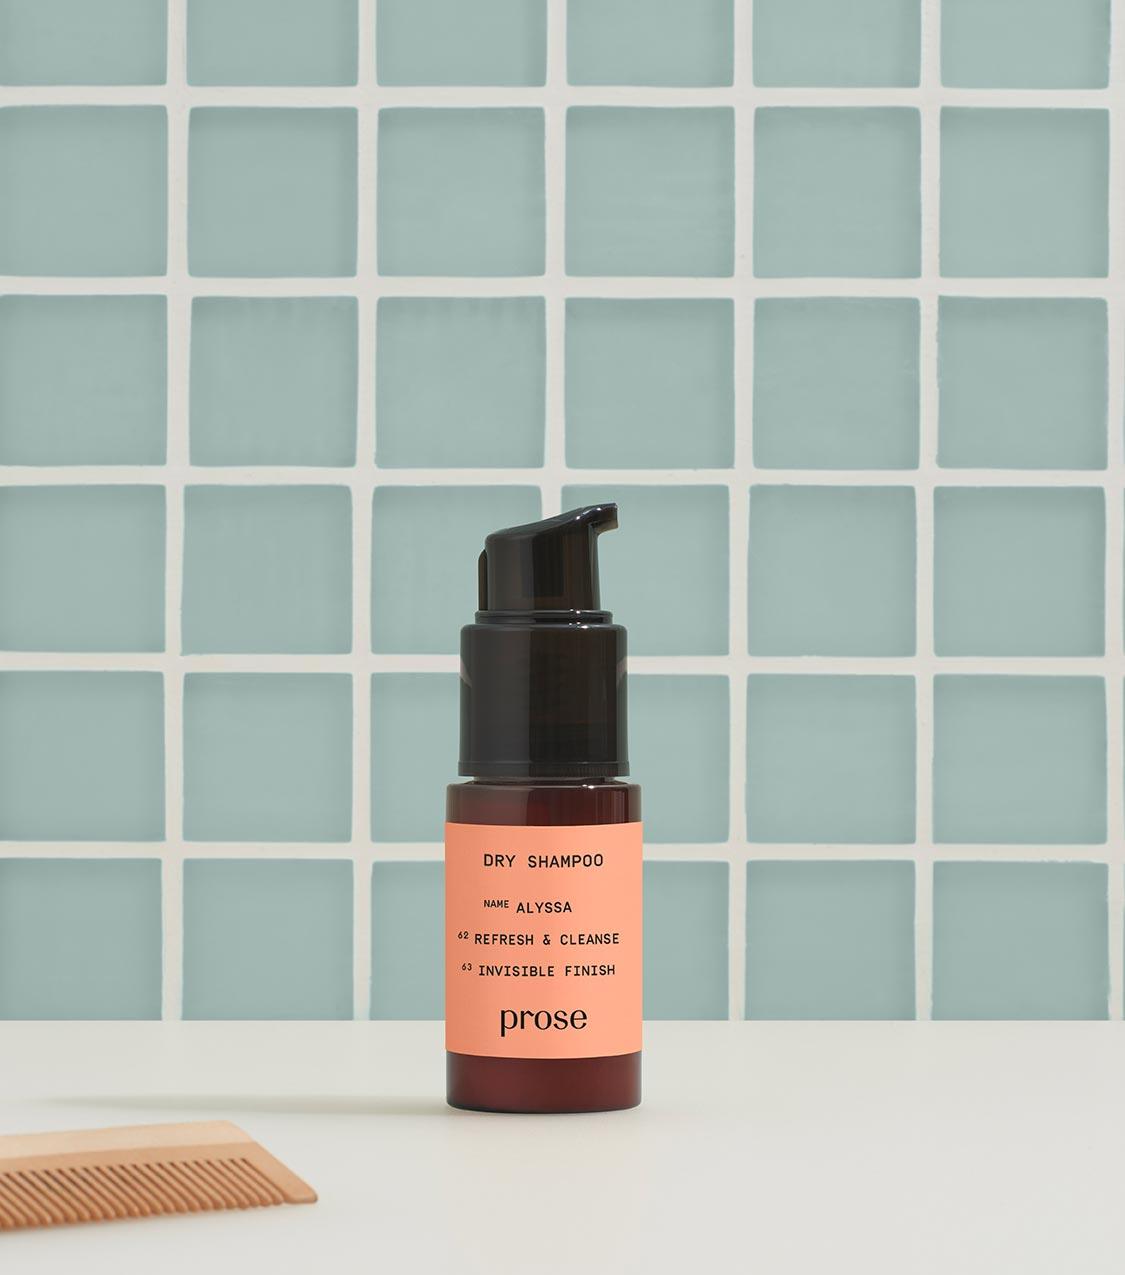 dry shampoo powder prose